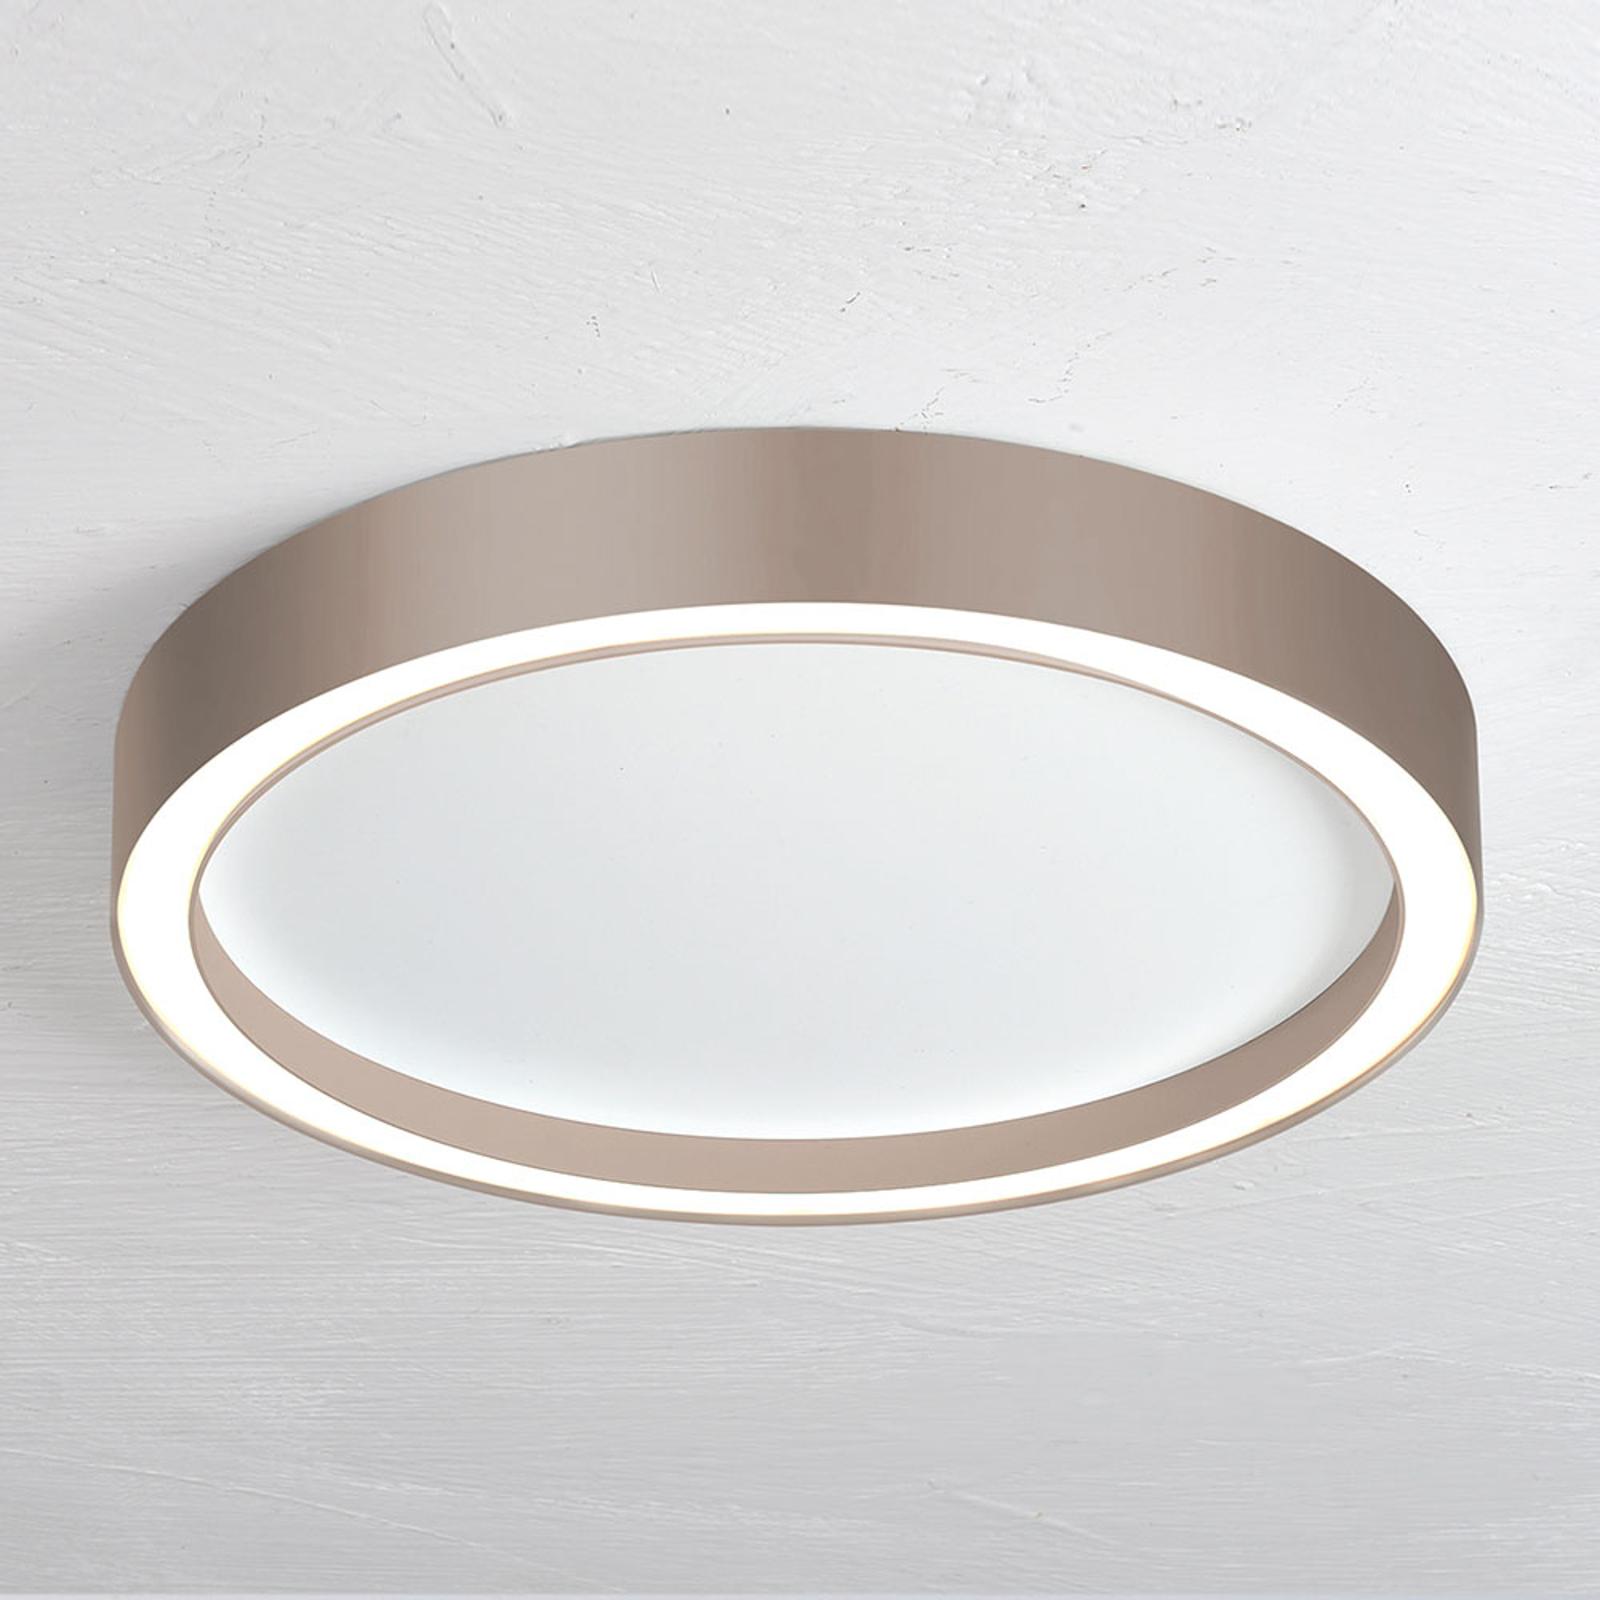 Bopp Aura LED plafondlamp Ø 30cm wit/taupe